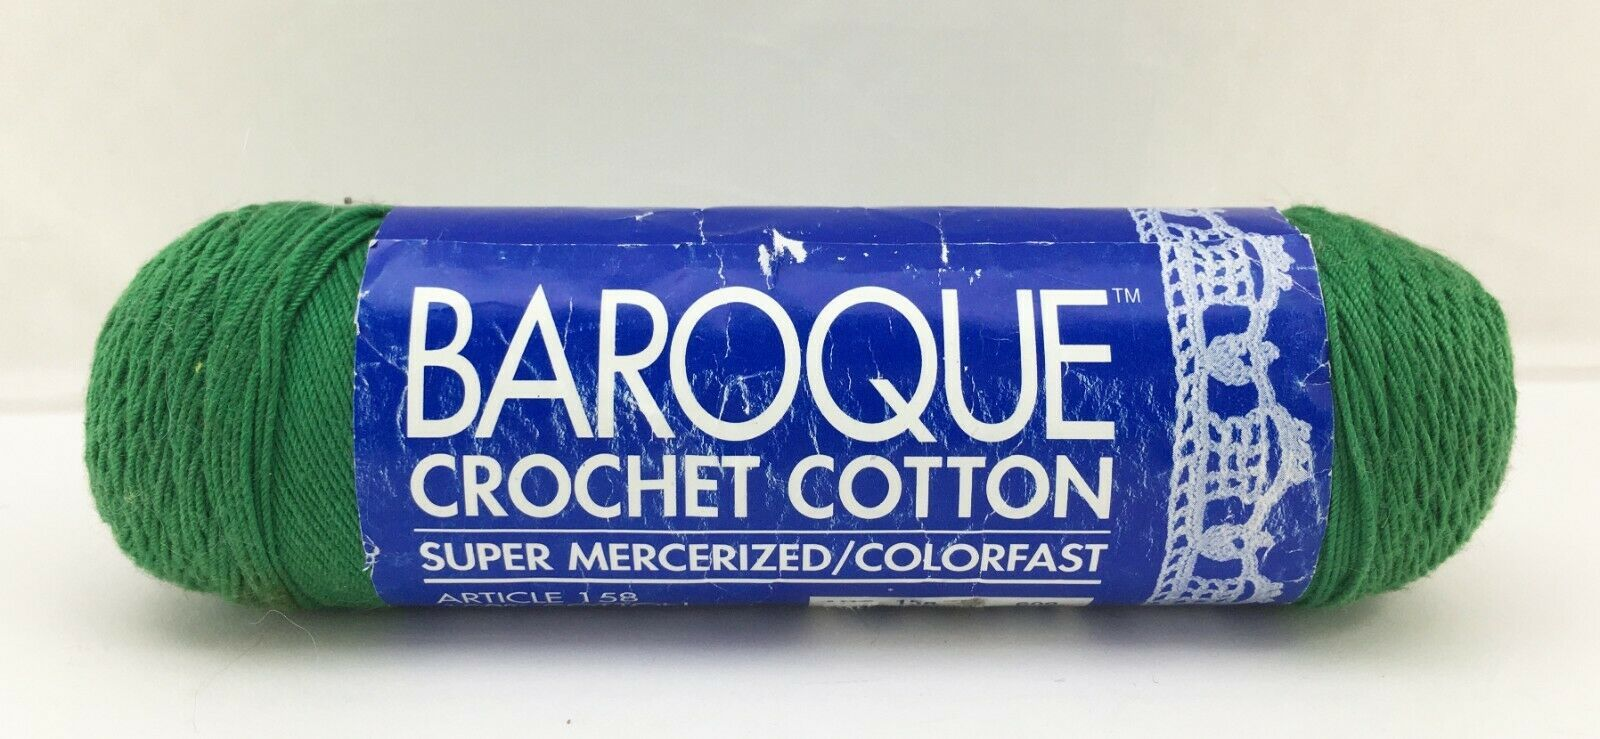 DMC Baroque Cotton Crochet Thread - One Skein Christmas Green #699 - $6.60